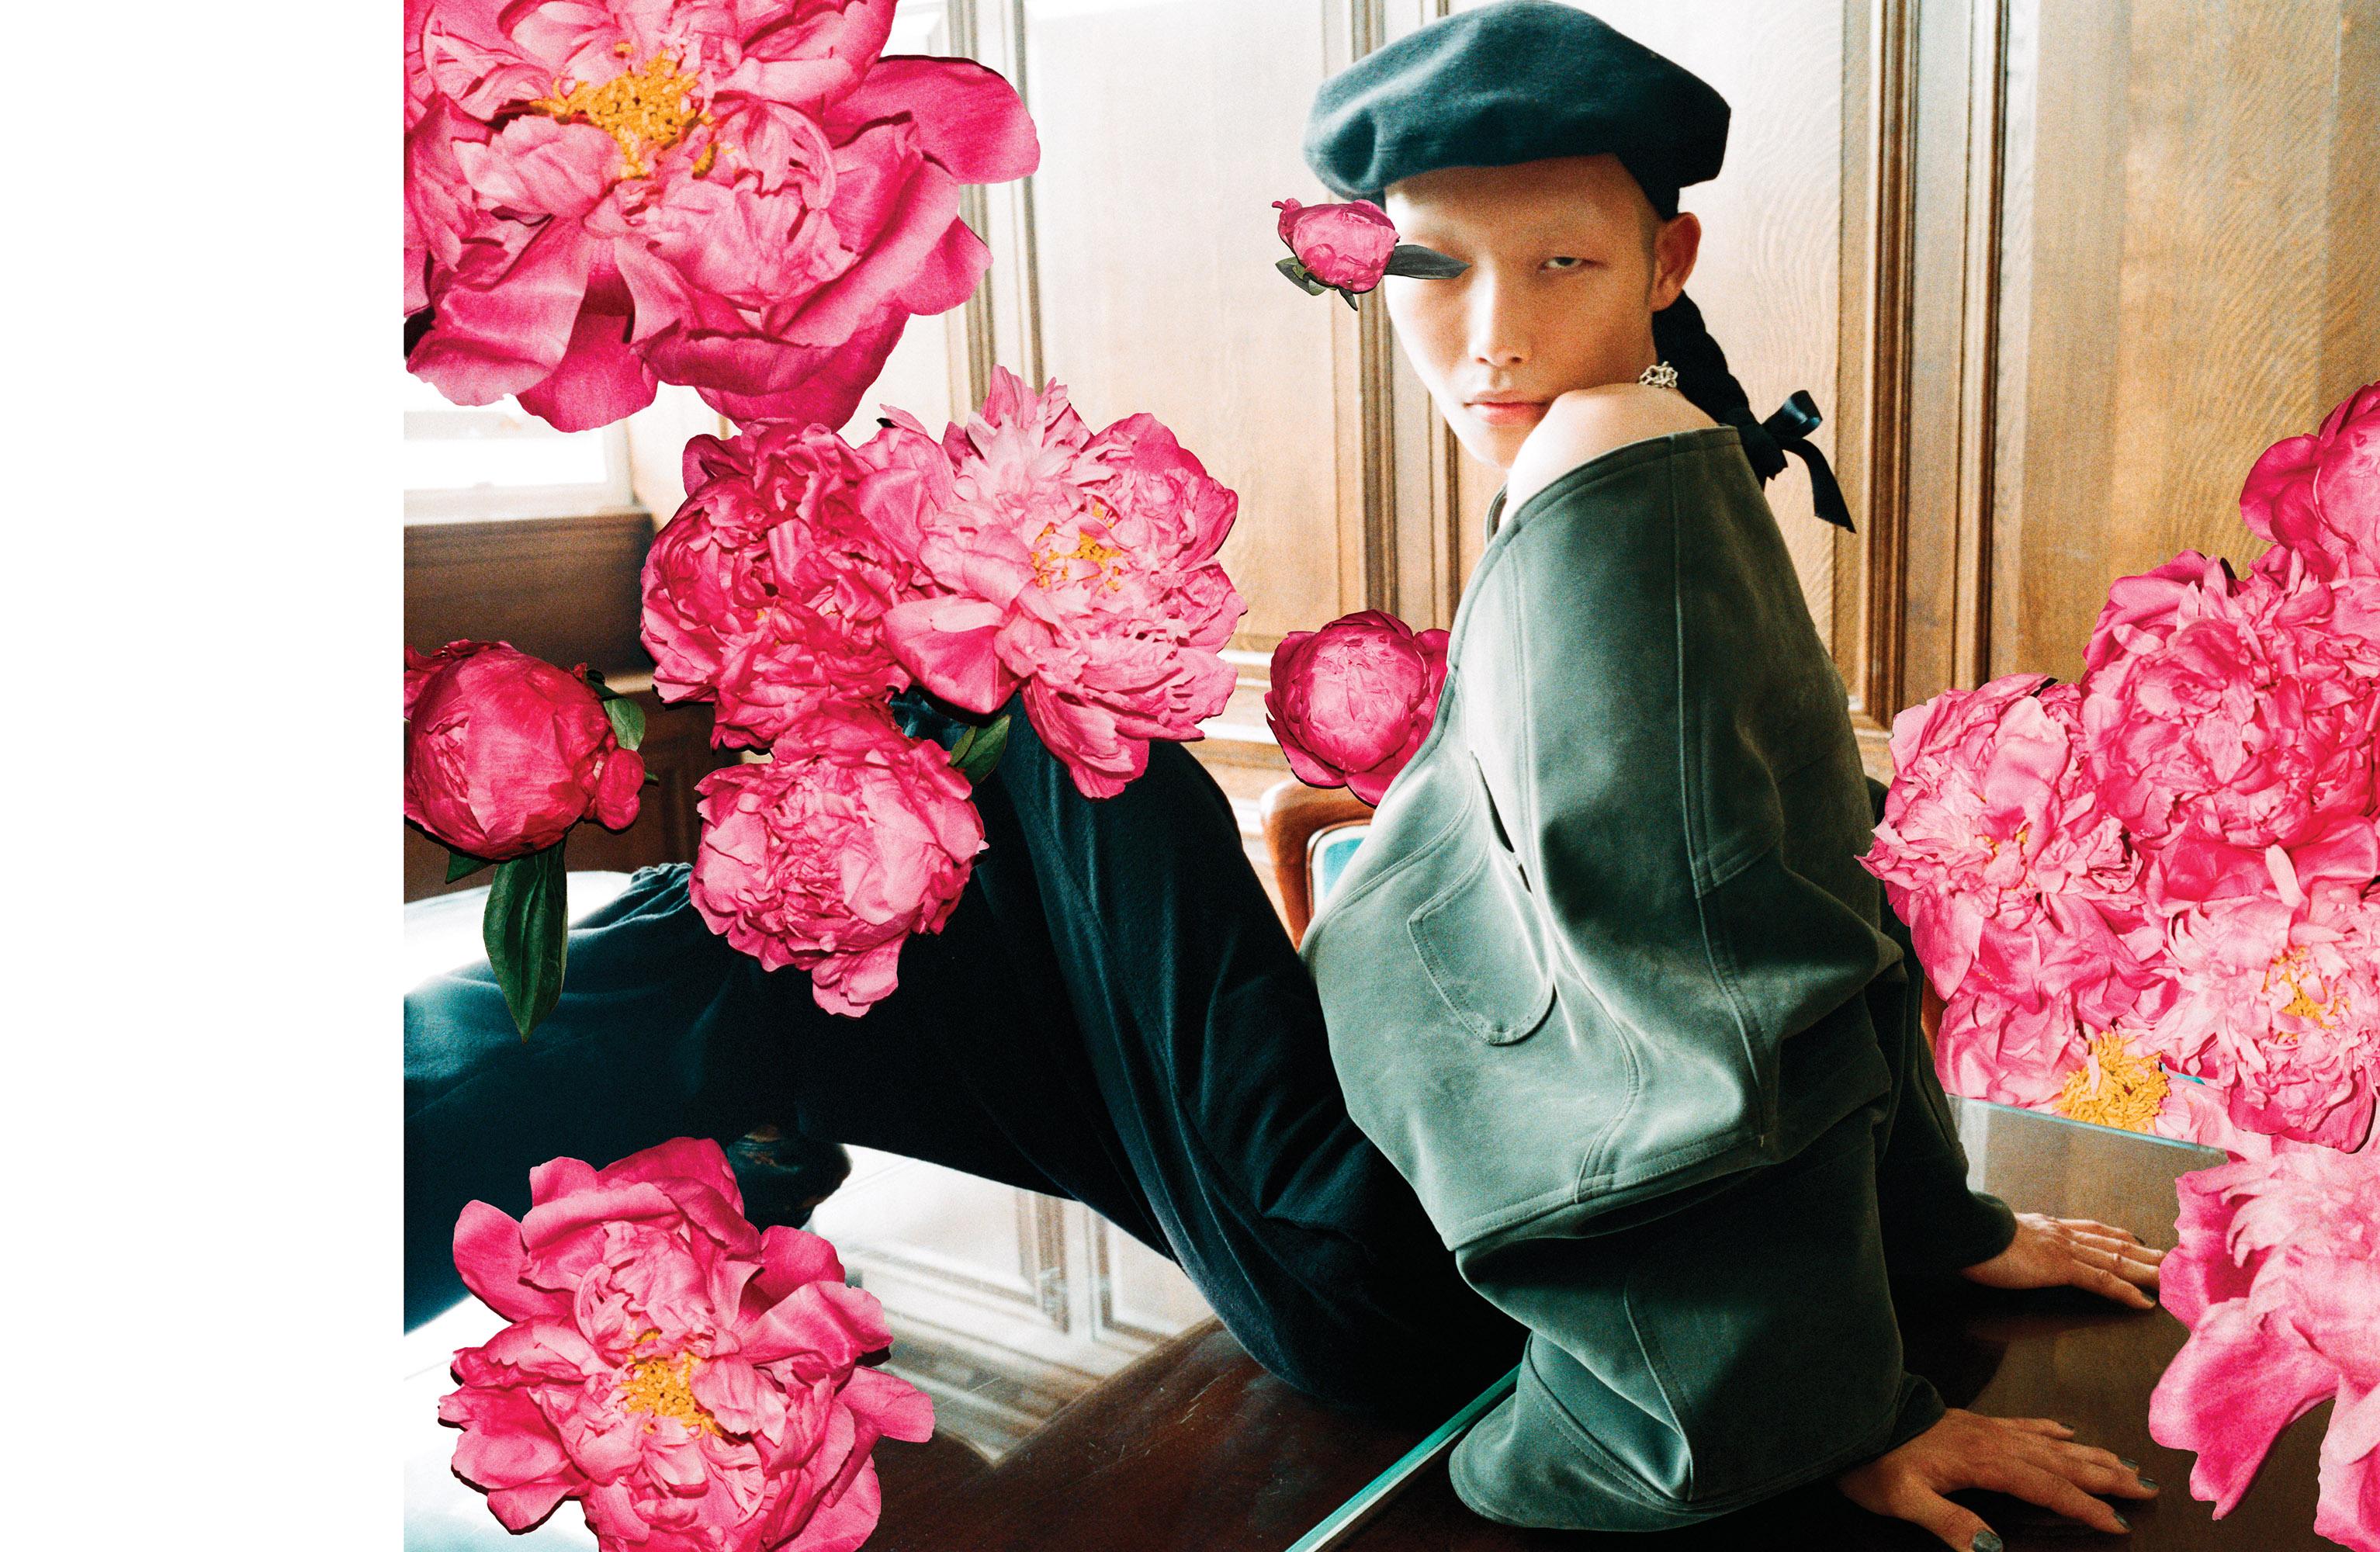 Hot house flower bombs john paul pietrus photography john paul hot house flower bombs john paul pietrus photography john paul pietrus photography mightylinksfo